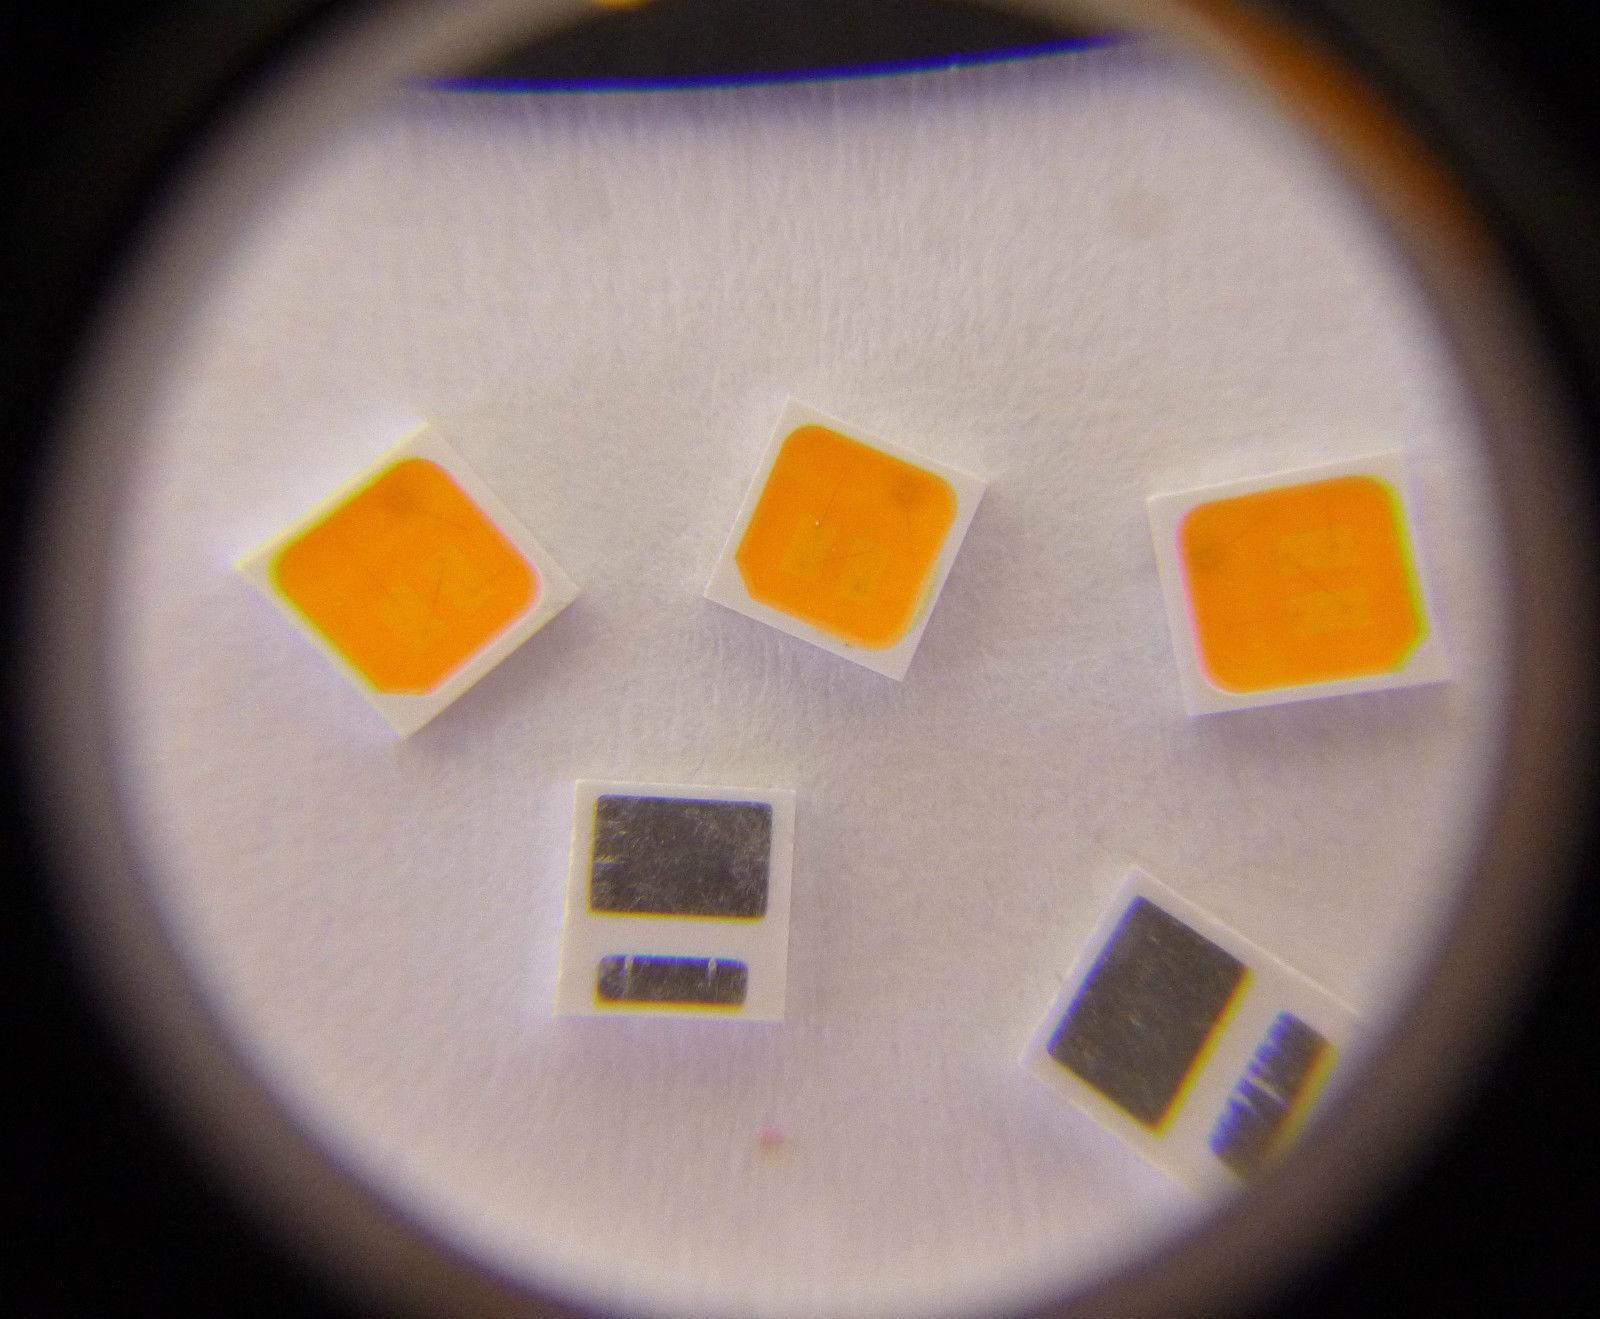 50 Stück 50 pieces OSRAM DURIS S5 LED 6500K CRI 82 ~1.0W 3030 GW PSLPS1.EC